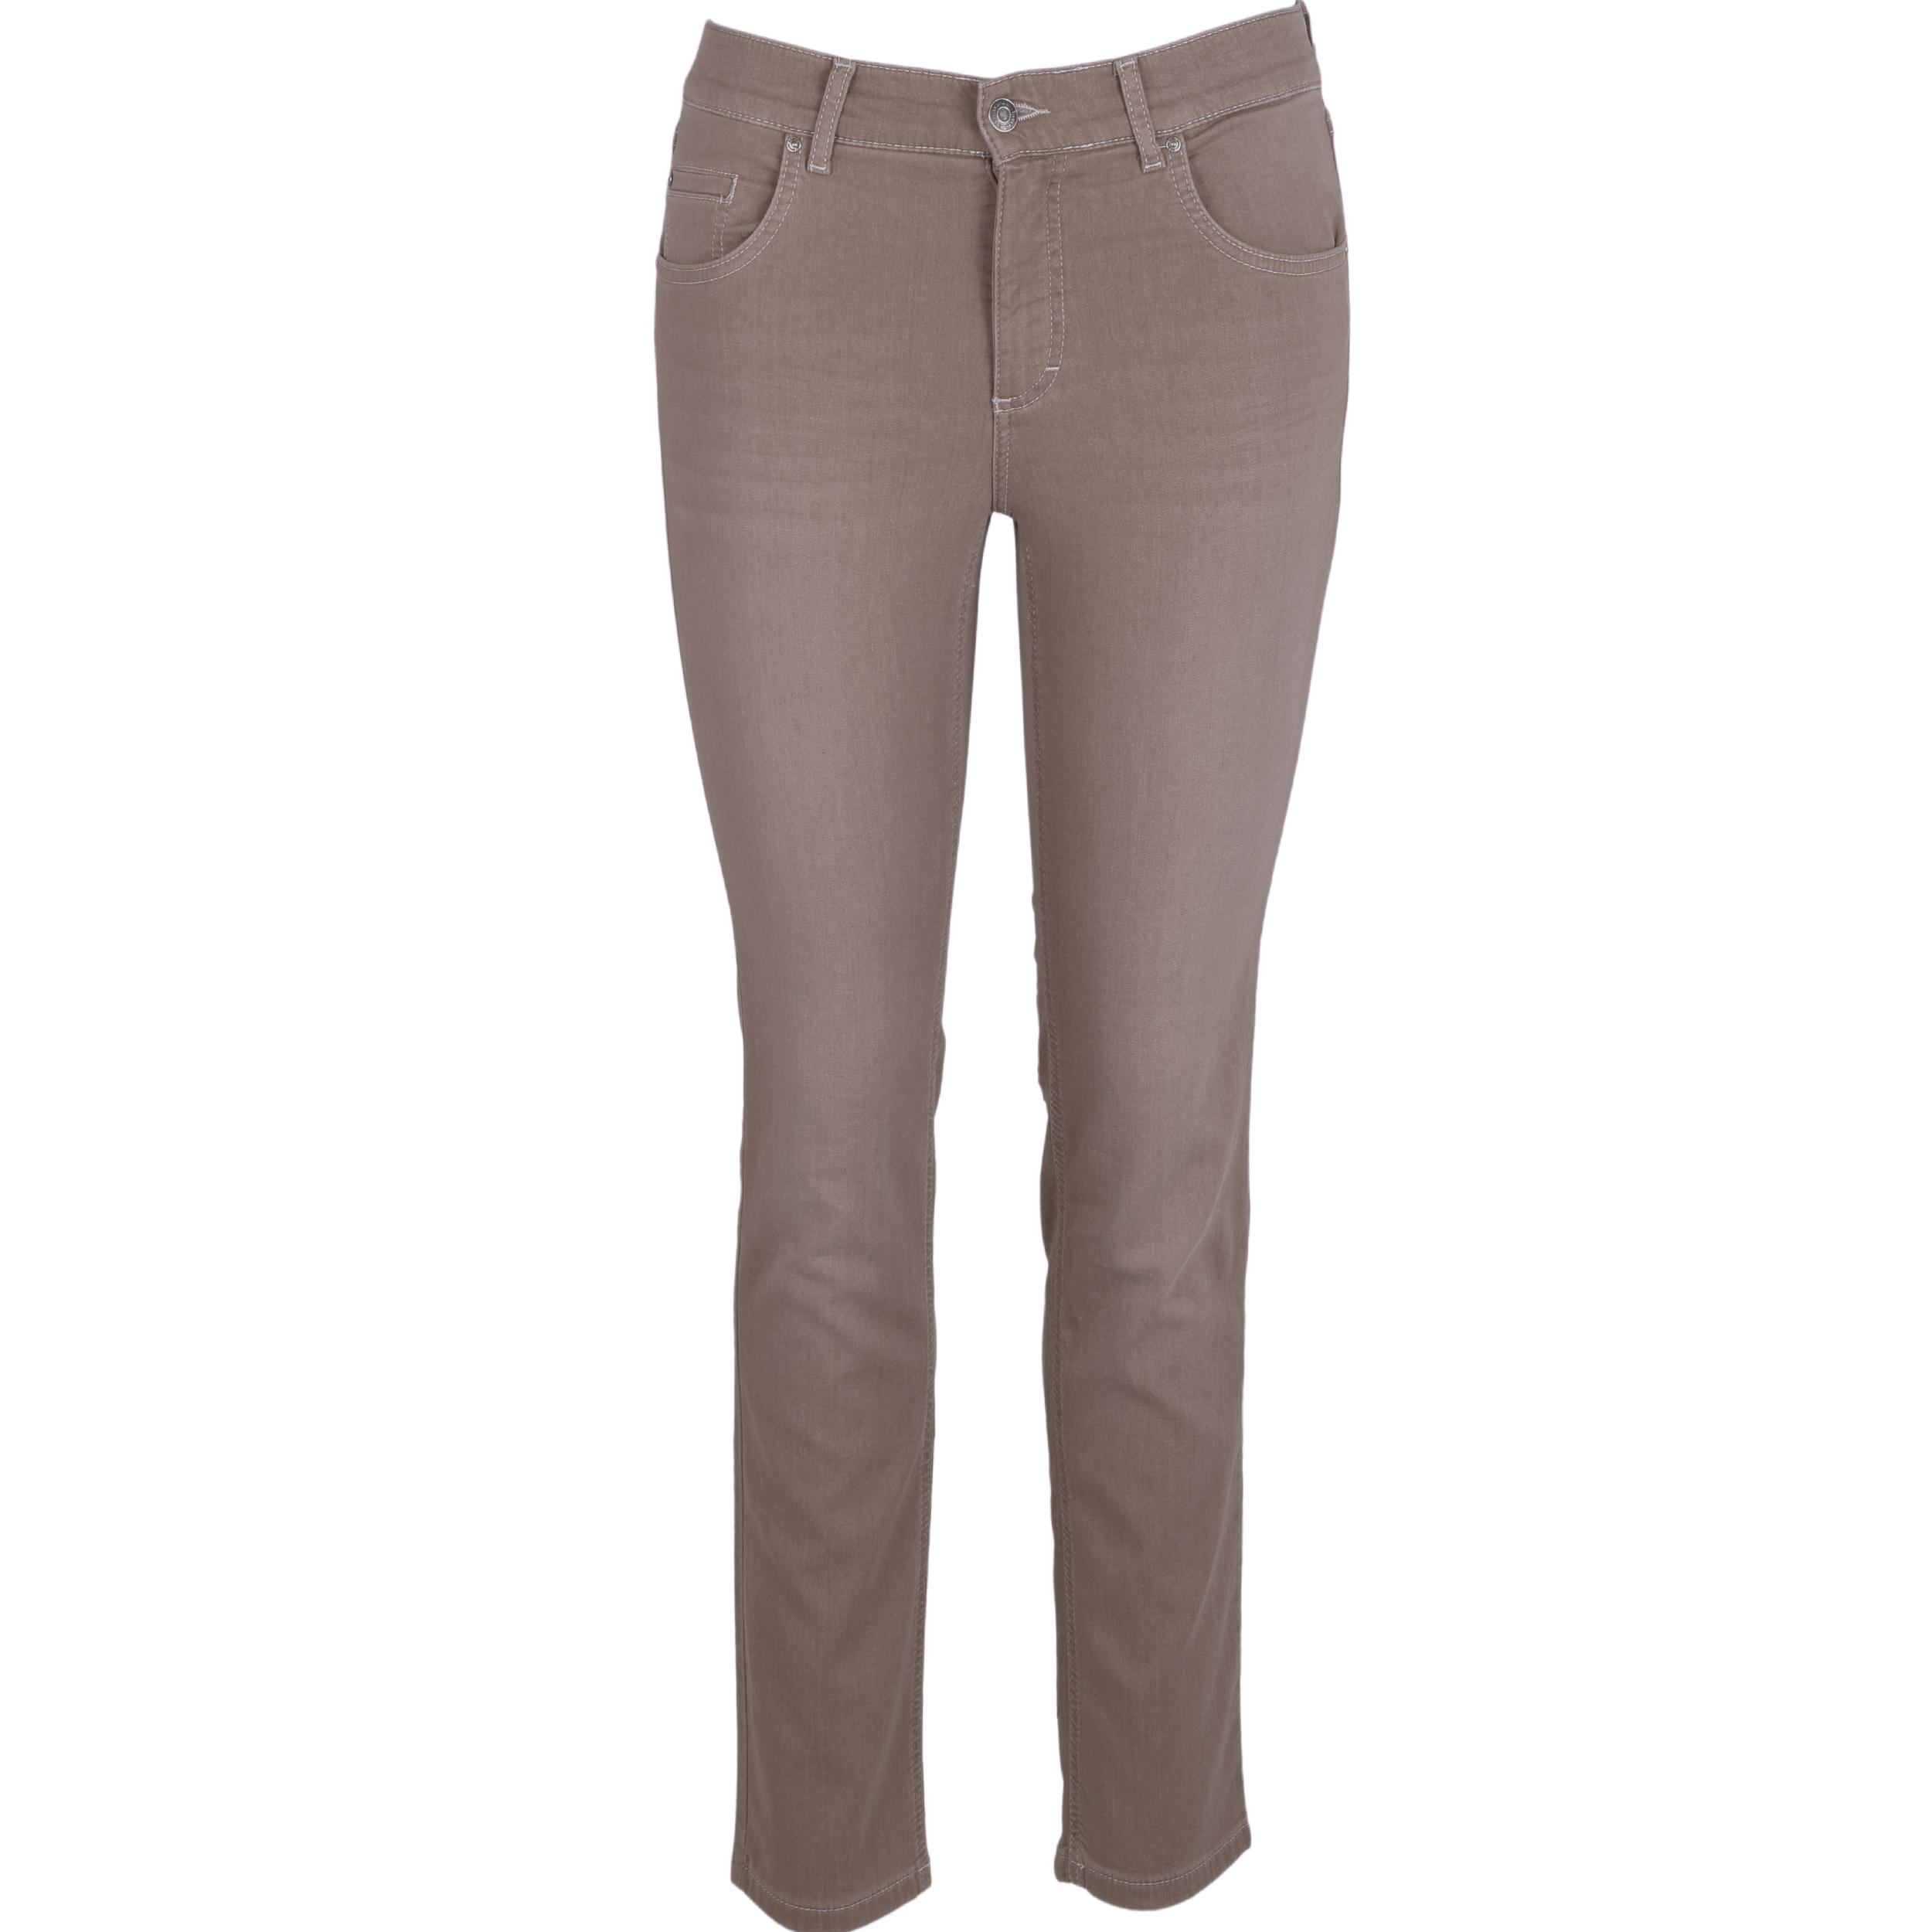 Angels Damen Jeans Cici Sweat Pants - hellbraun 38/30